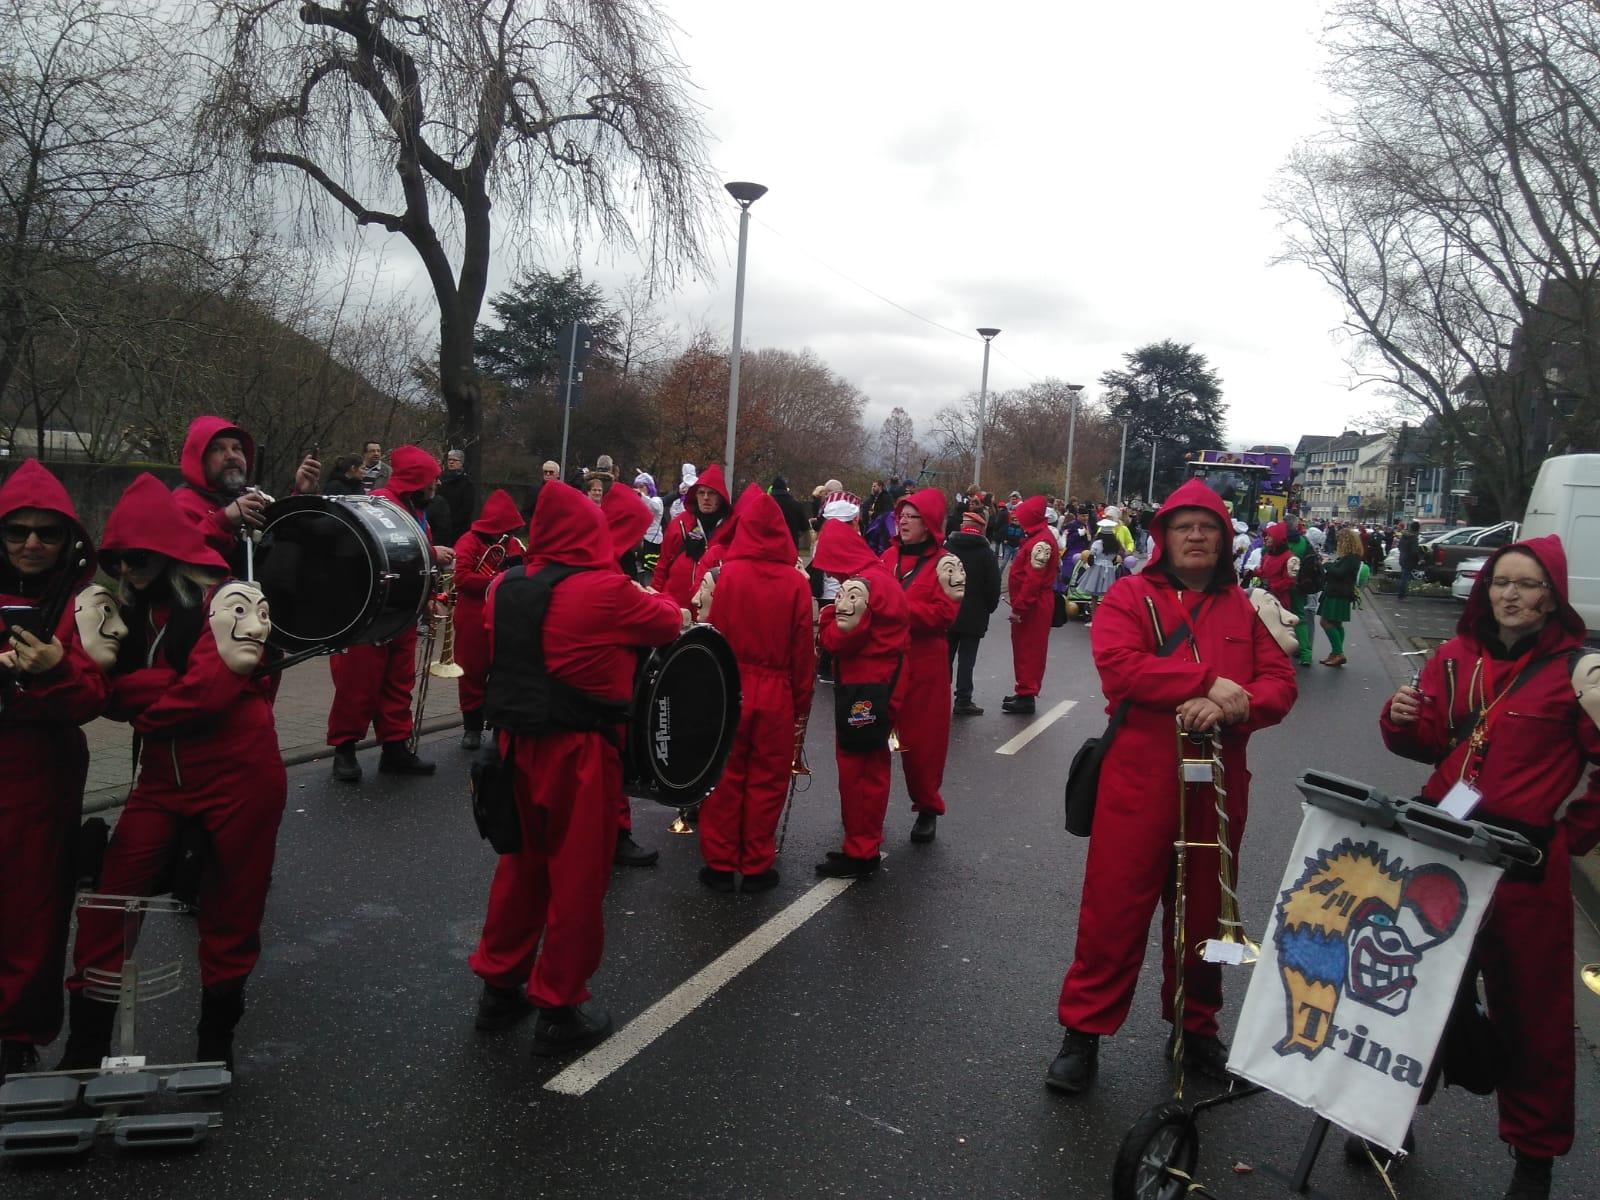 NoName-Guggen-Andernach-2020-Karneval-113